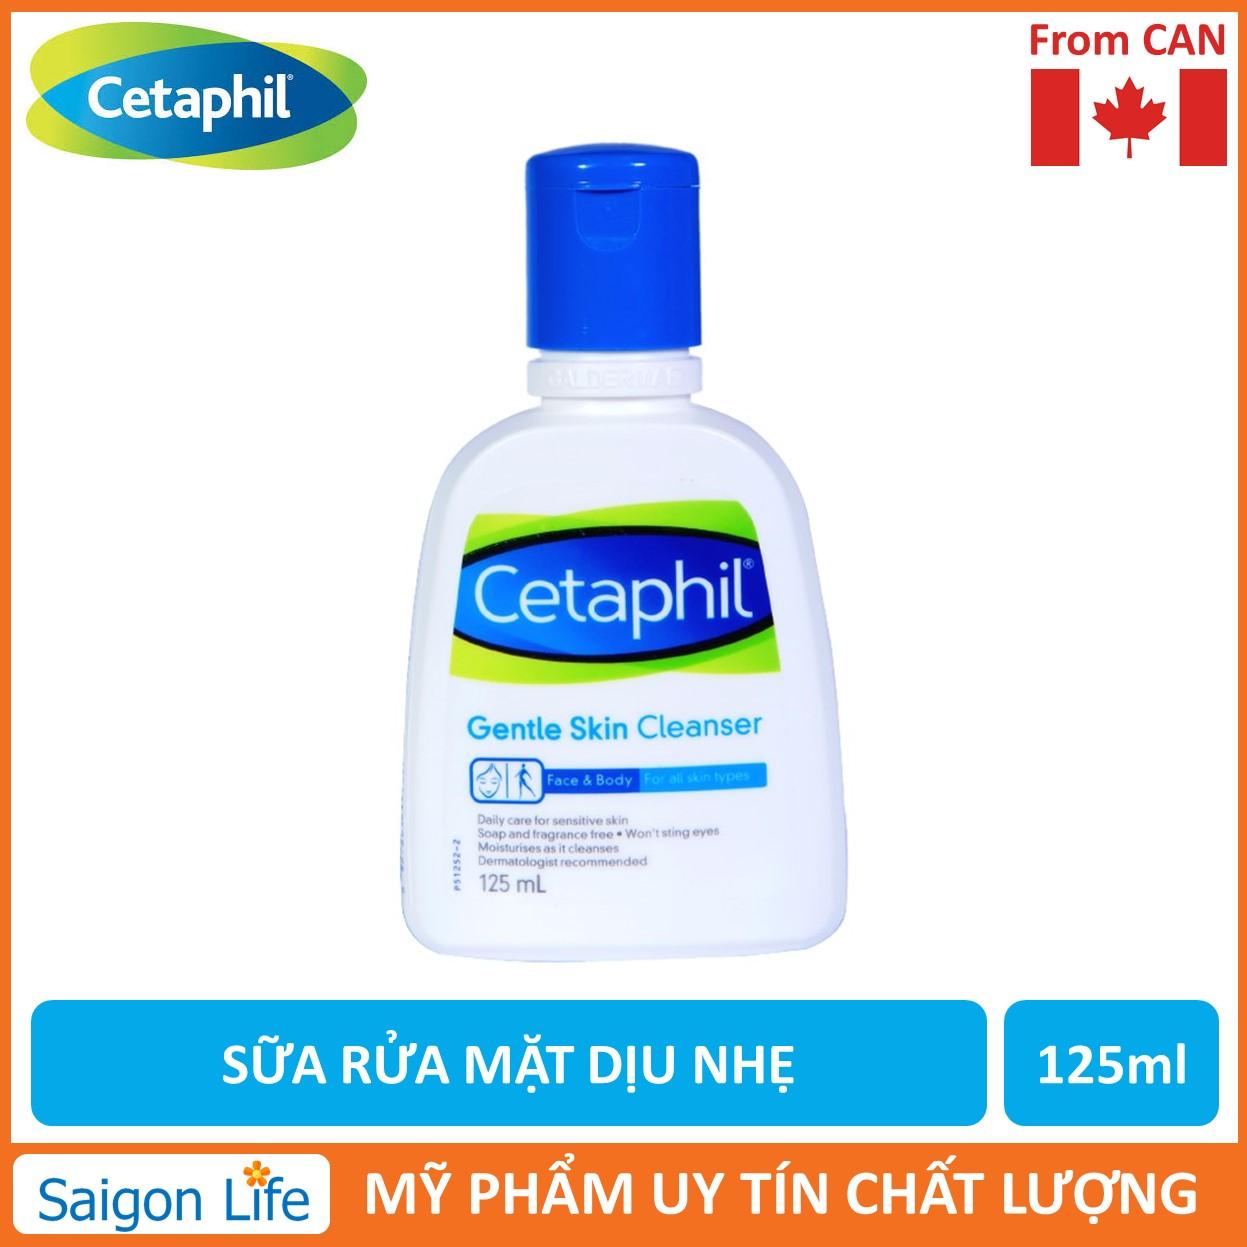 Sữa Rửa Mặt Cetaphil Gentle Skin Cleanser 125ml Giá Giảm